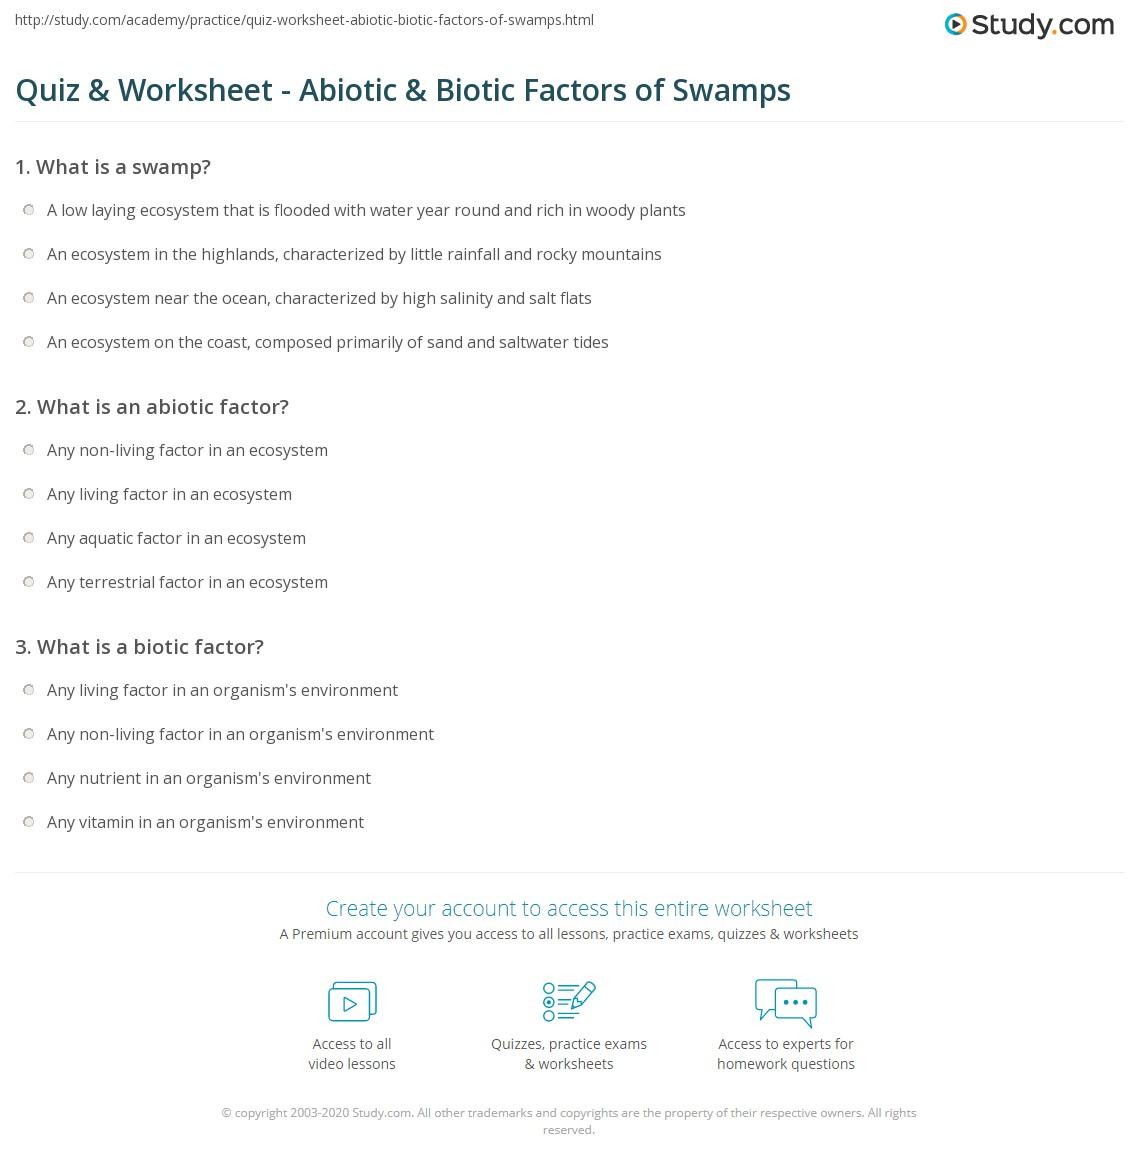 quiz worksheet abiotic biotic factors of swamps. Black Bedroom Furniture Sets. Home Design Ideas